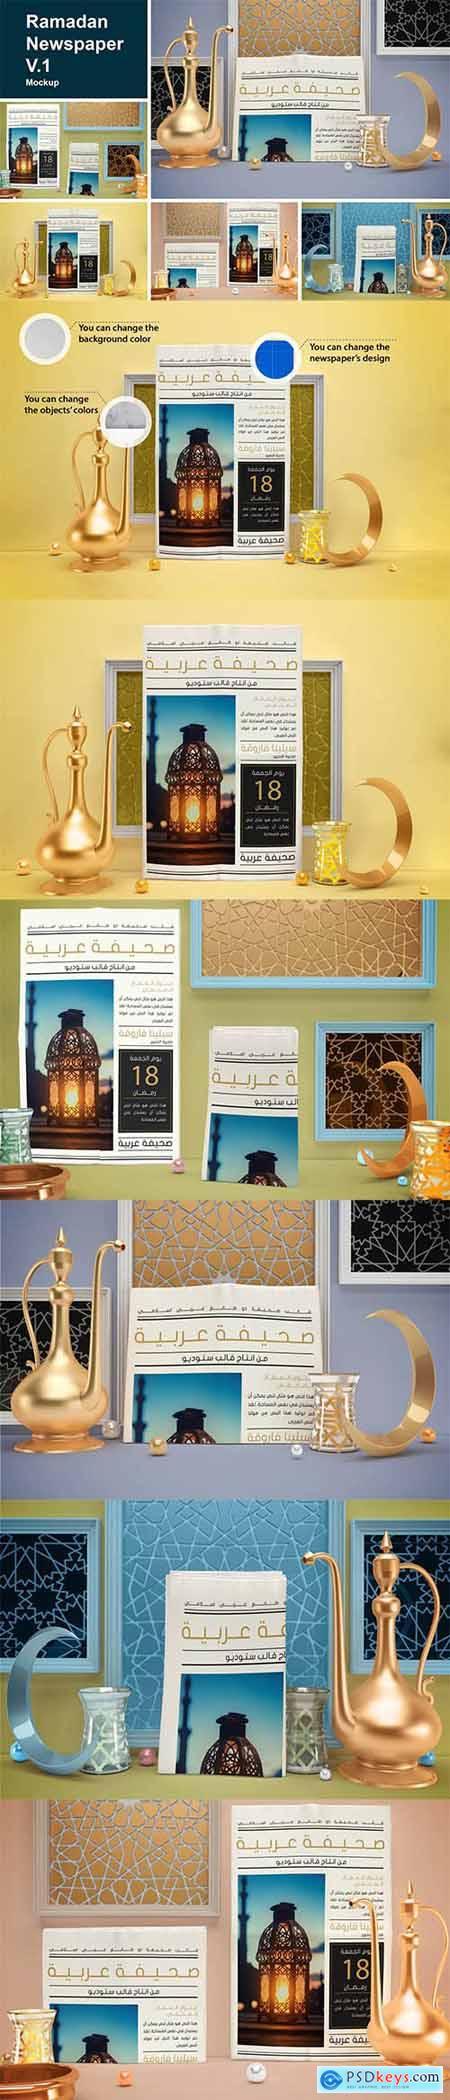 Ramadan Newspaper V.1